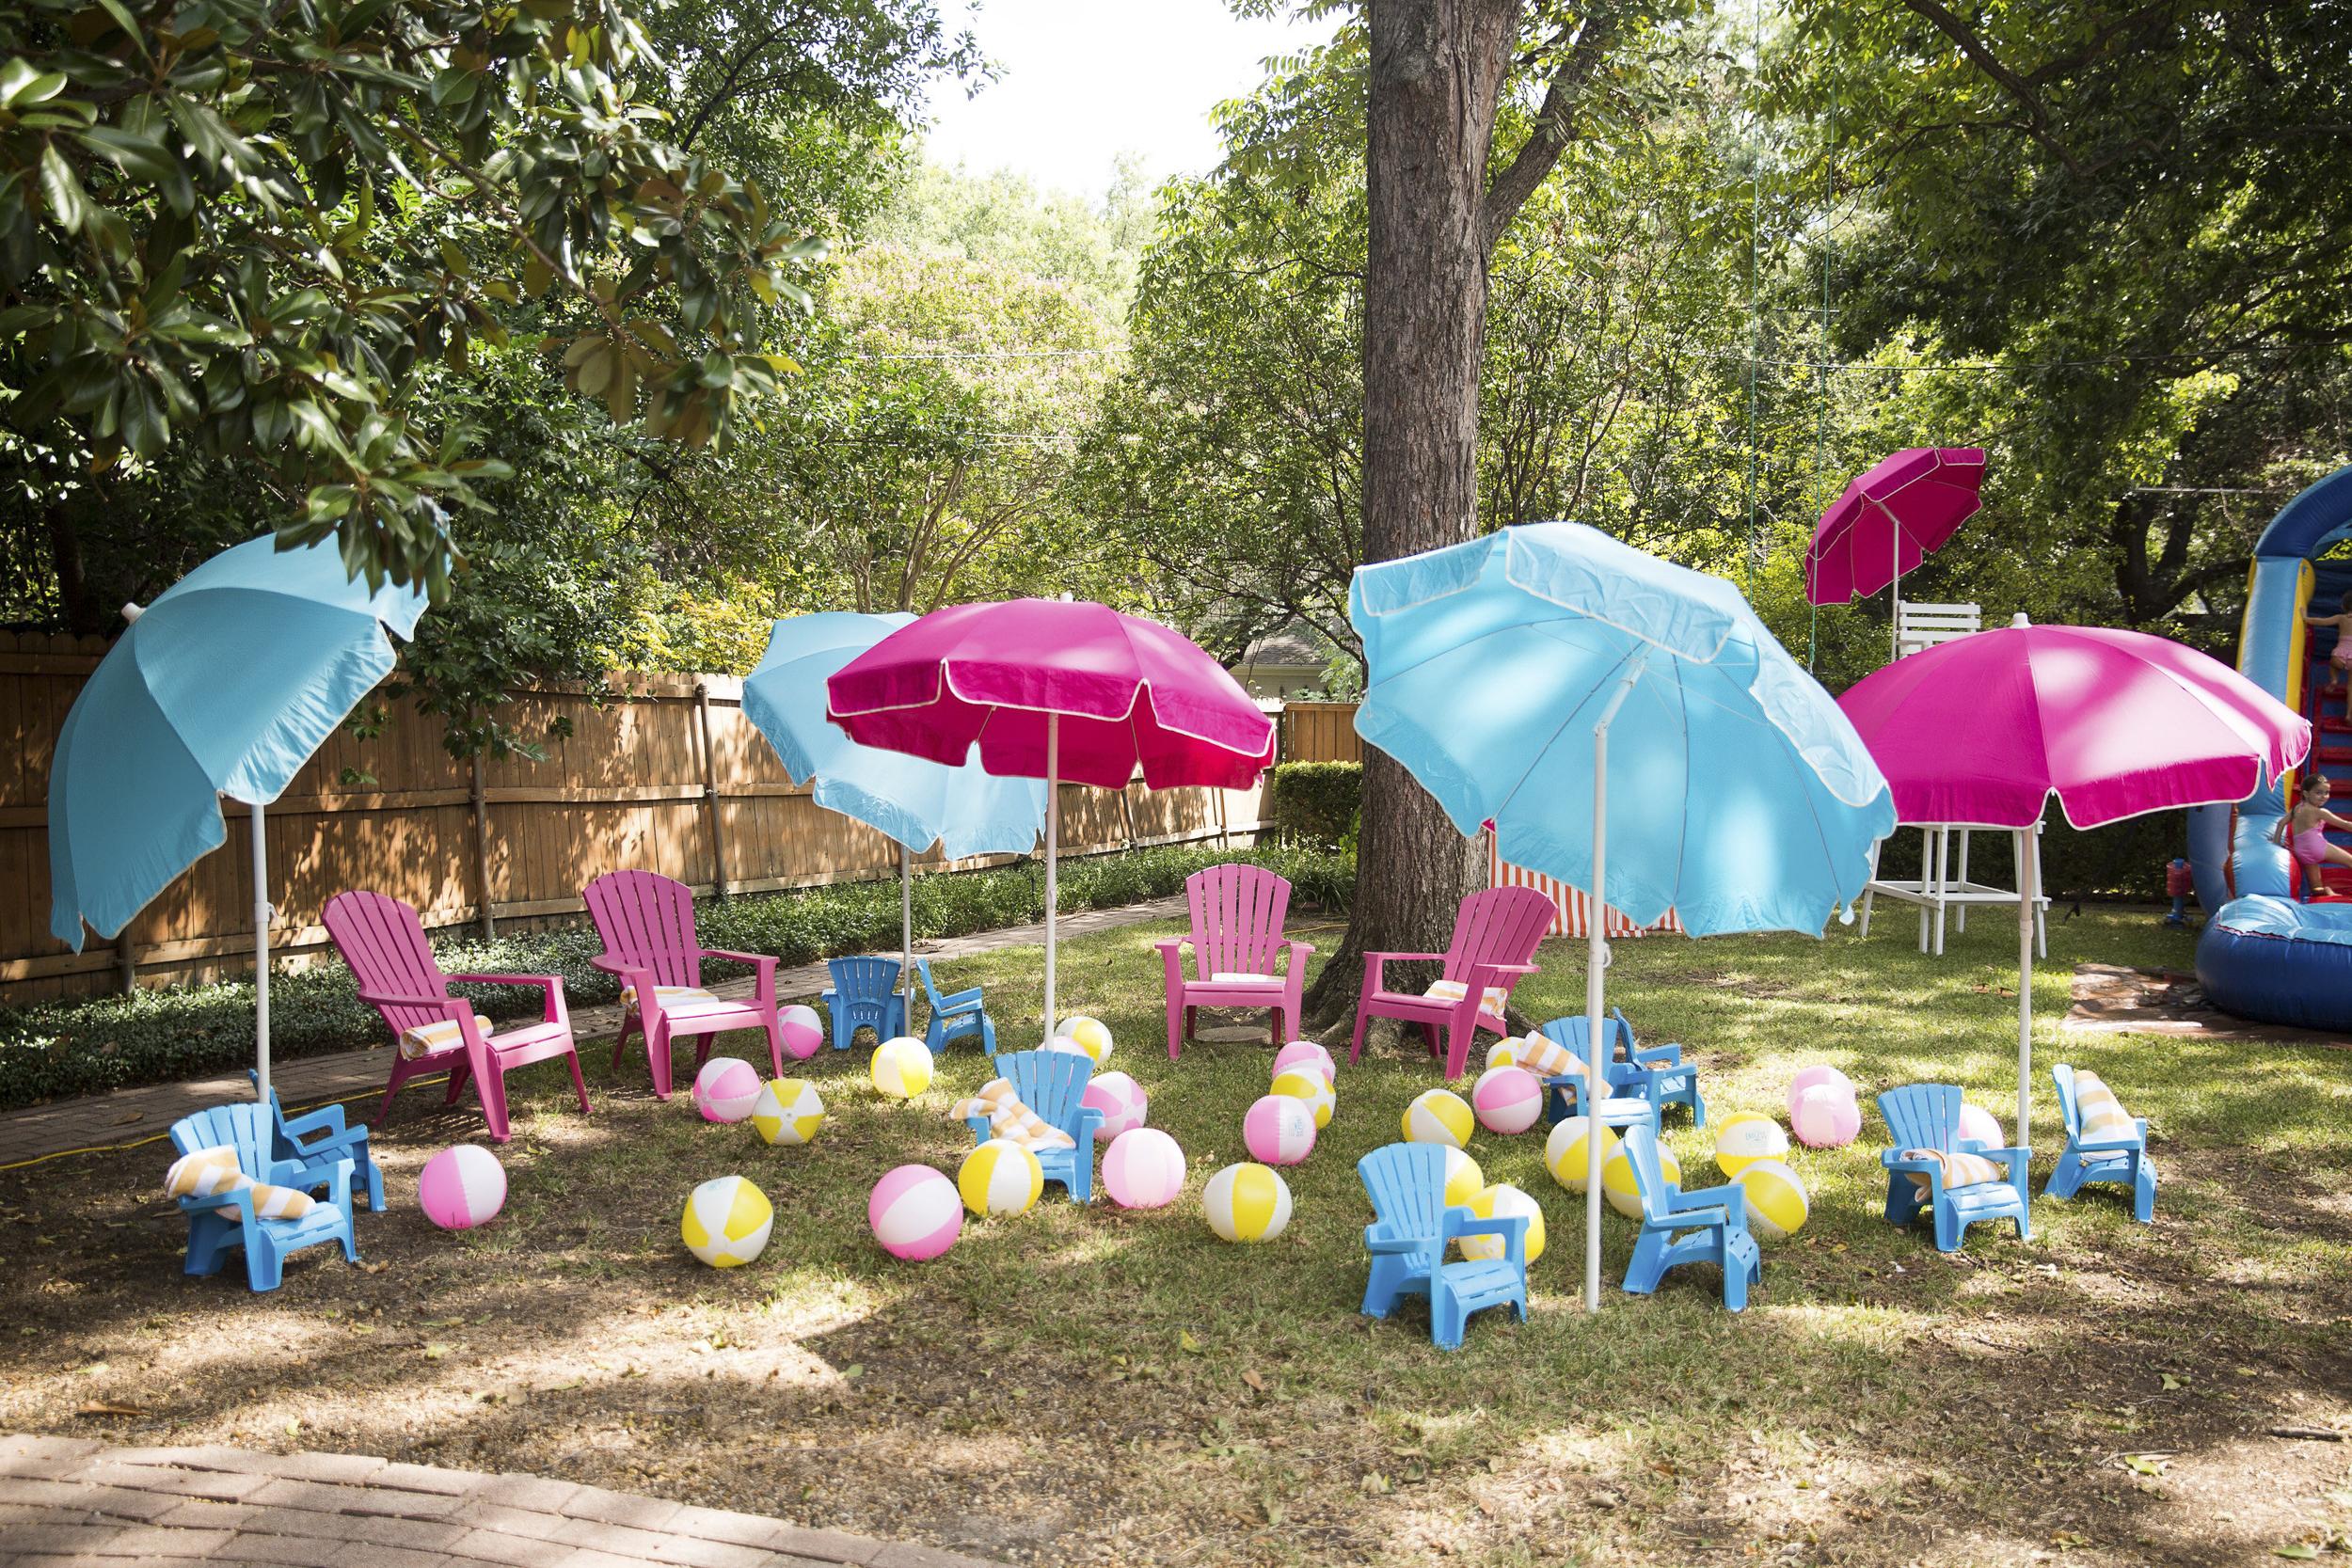 dallas_texas_birthday_party_mae_emily_clarke_events_kids_retro_pool_swim_endless_summer_invitations_ceci_new_york_watercolor_illustration_decor-9.jpg